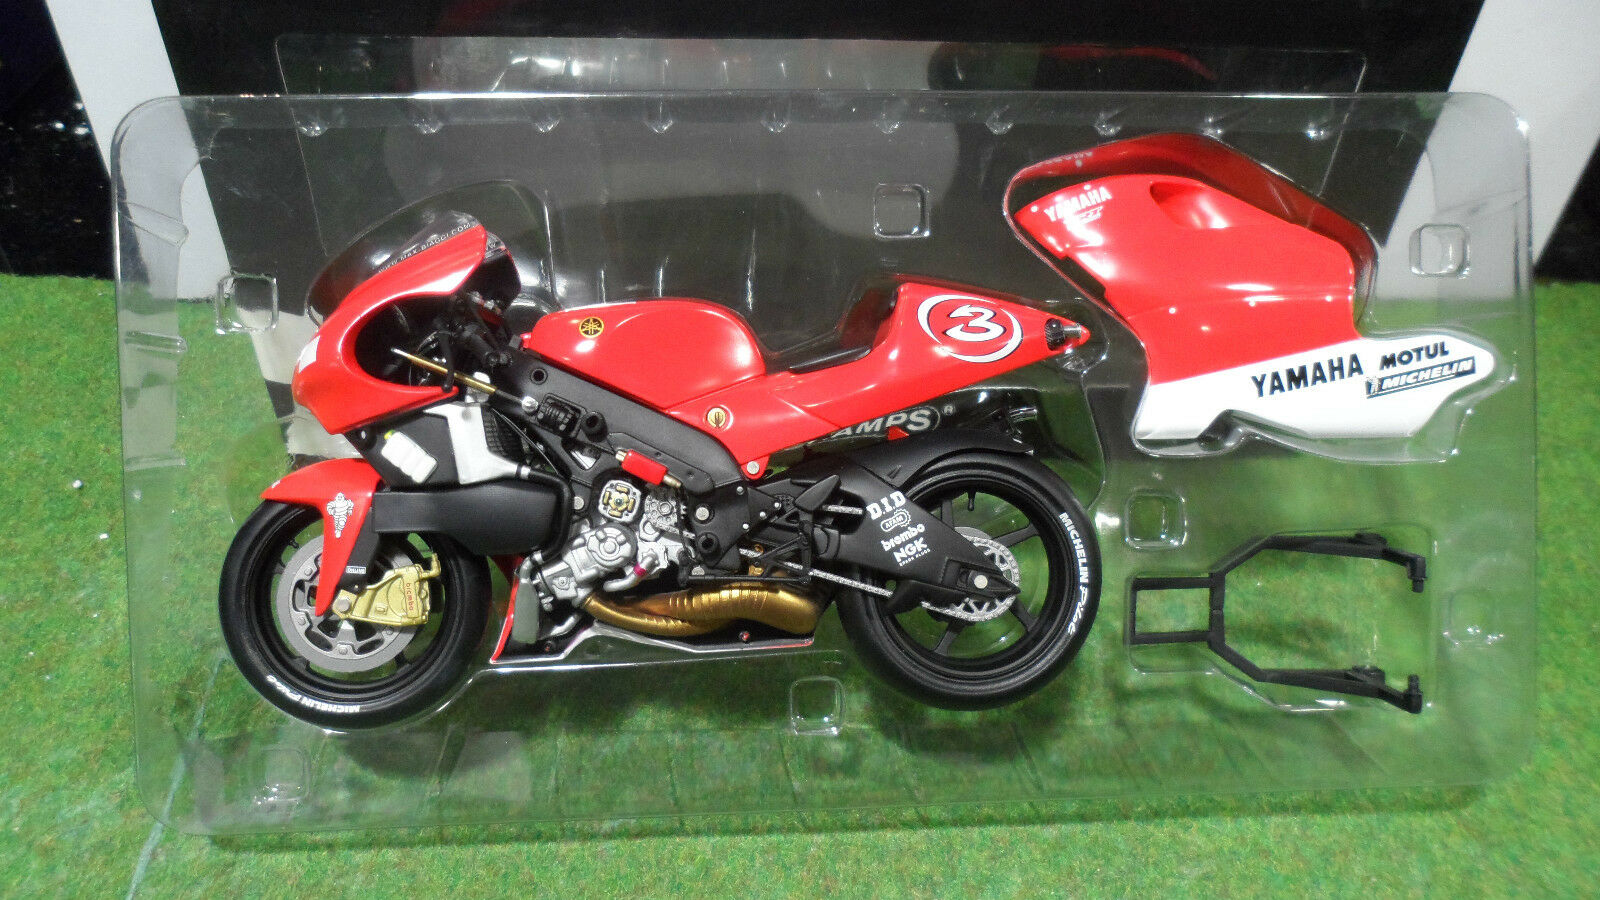 MOTO YAMAHA YZR 500 Max Biaggi de 2001 au 1 12 Minichamps 122016303 miniature